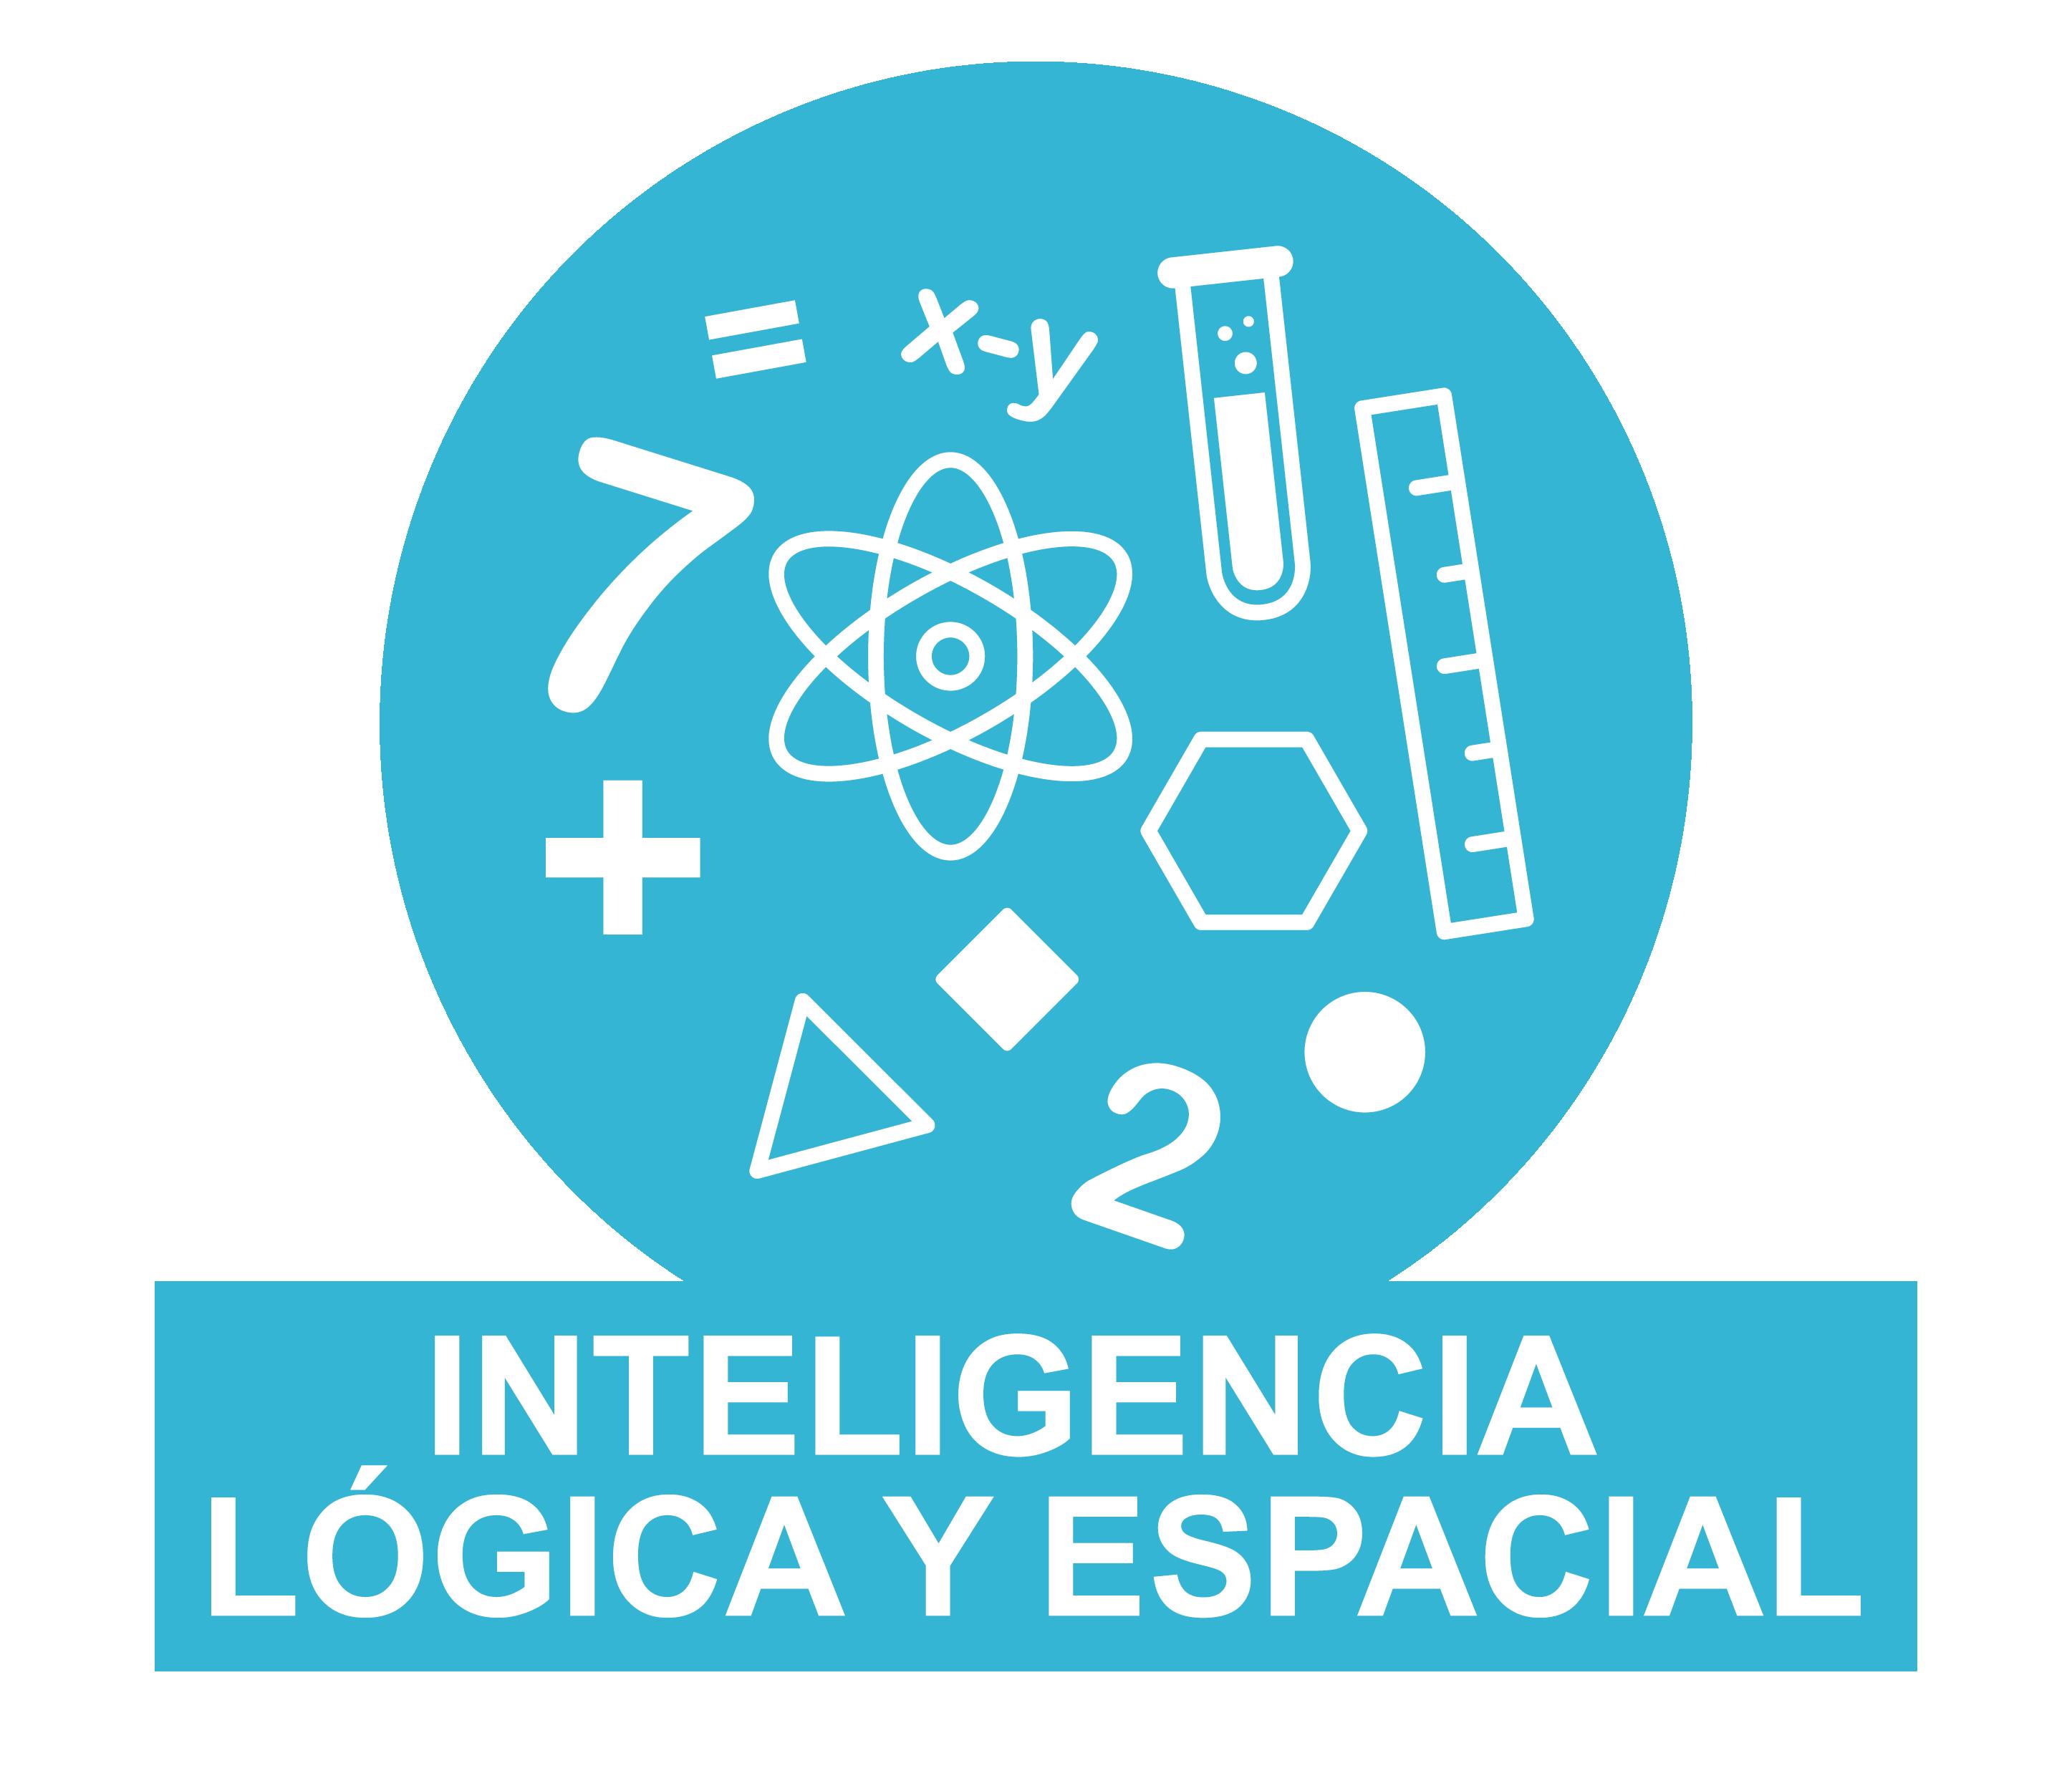 Inteligencia lógico matemática despierta grupal